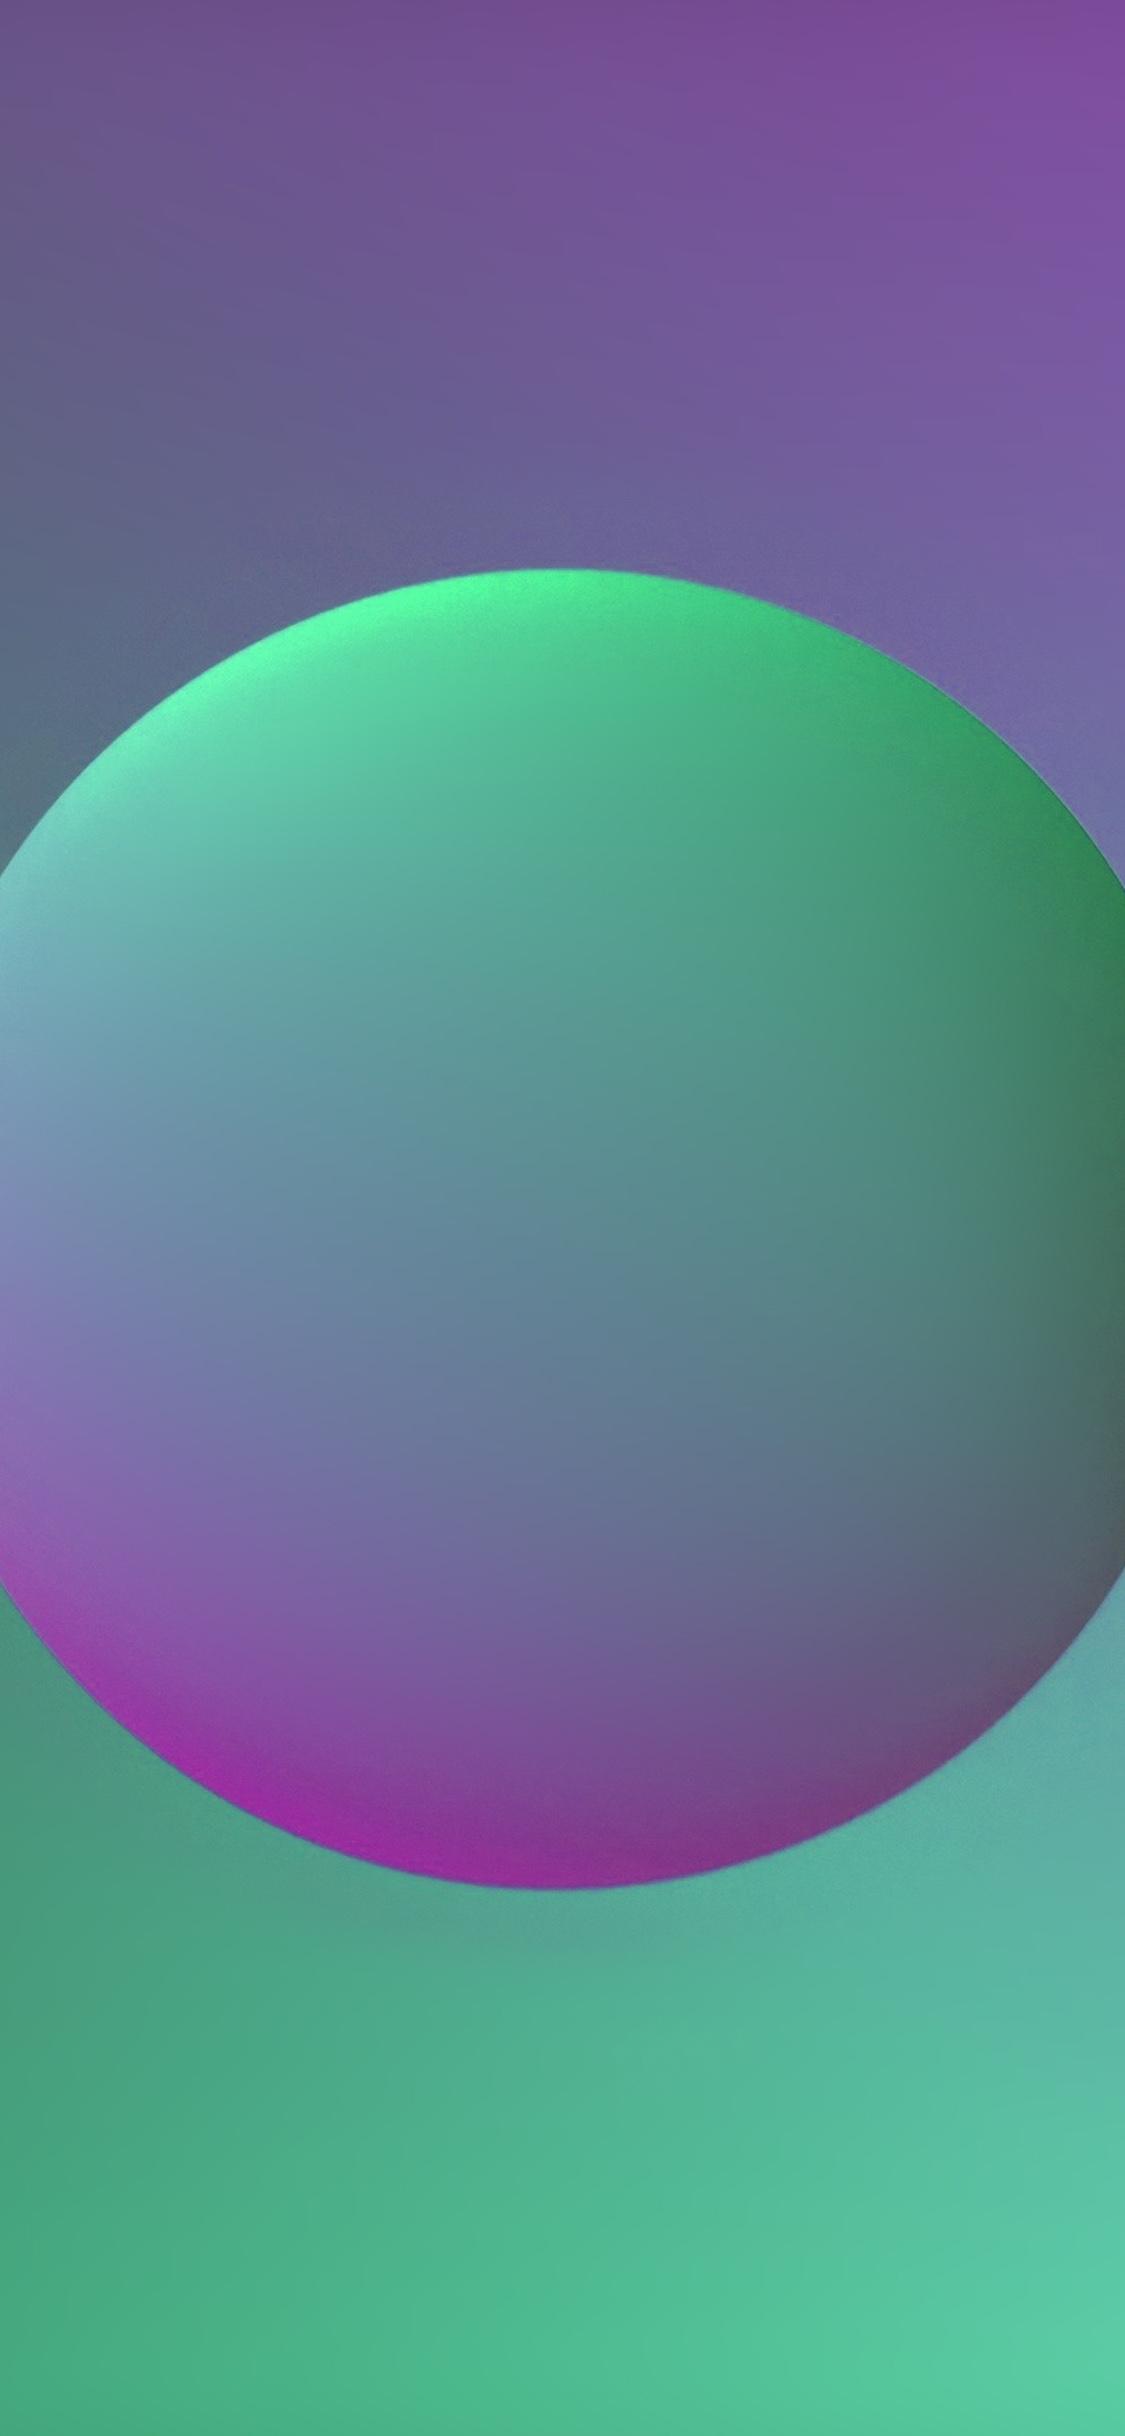 iPhoneXpapers.com-Apple-iPhone-wallpaper-ax58-minimal-ball-gradation-purple-green-illustration-art